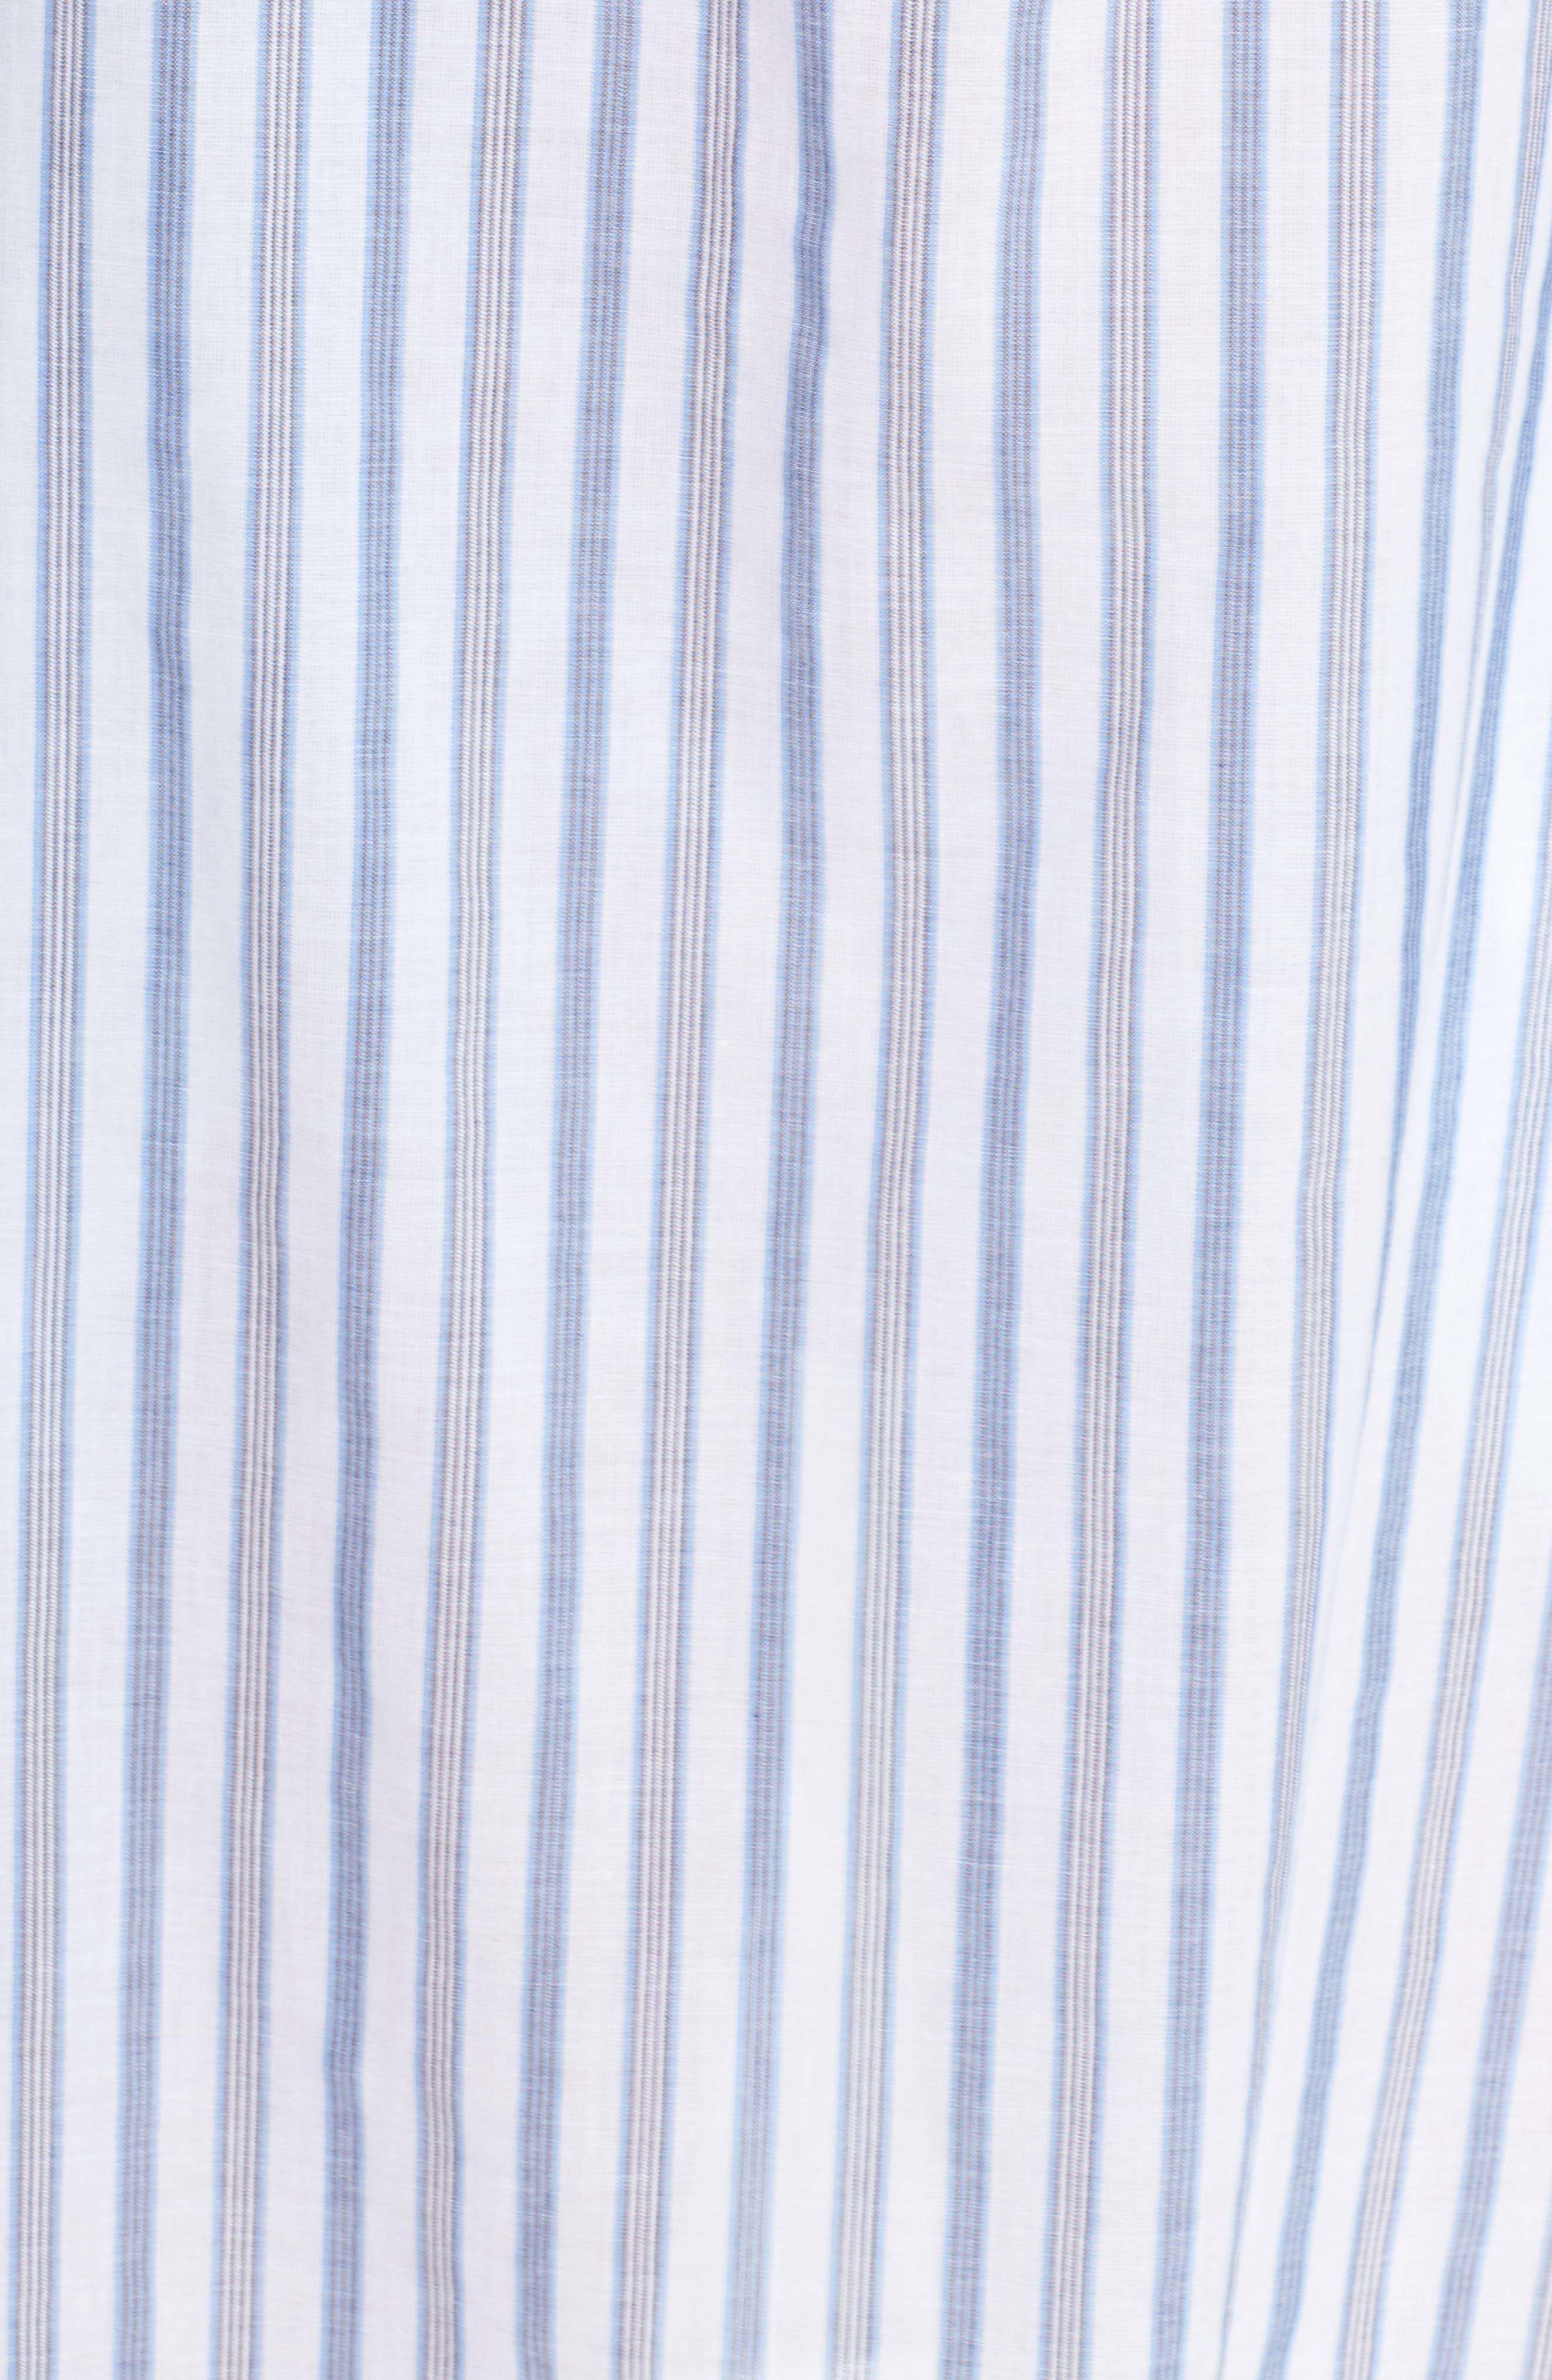 Ticking Stripe Off the Shoulder Cover-Up Dress,                             Alternate thumbnail 5, color,                             100